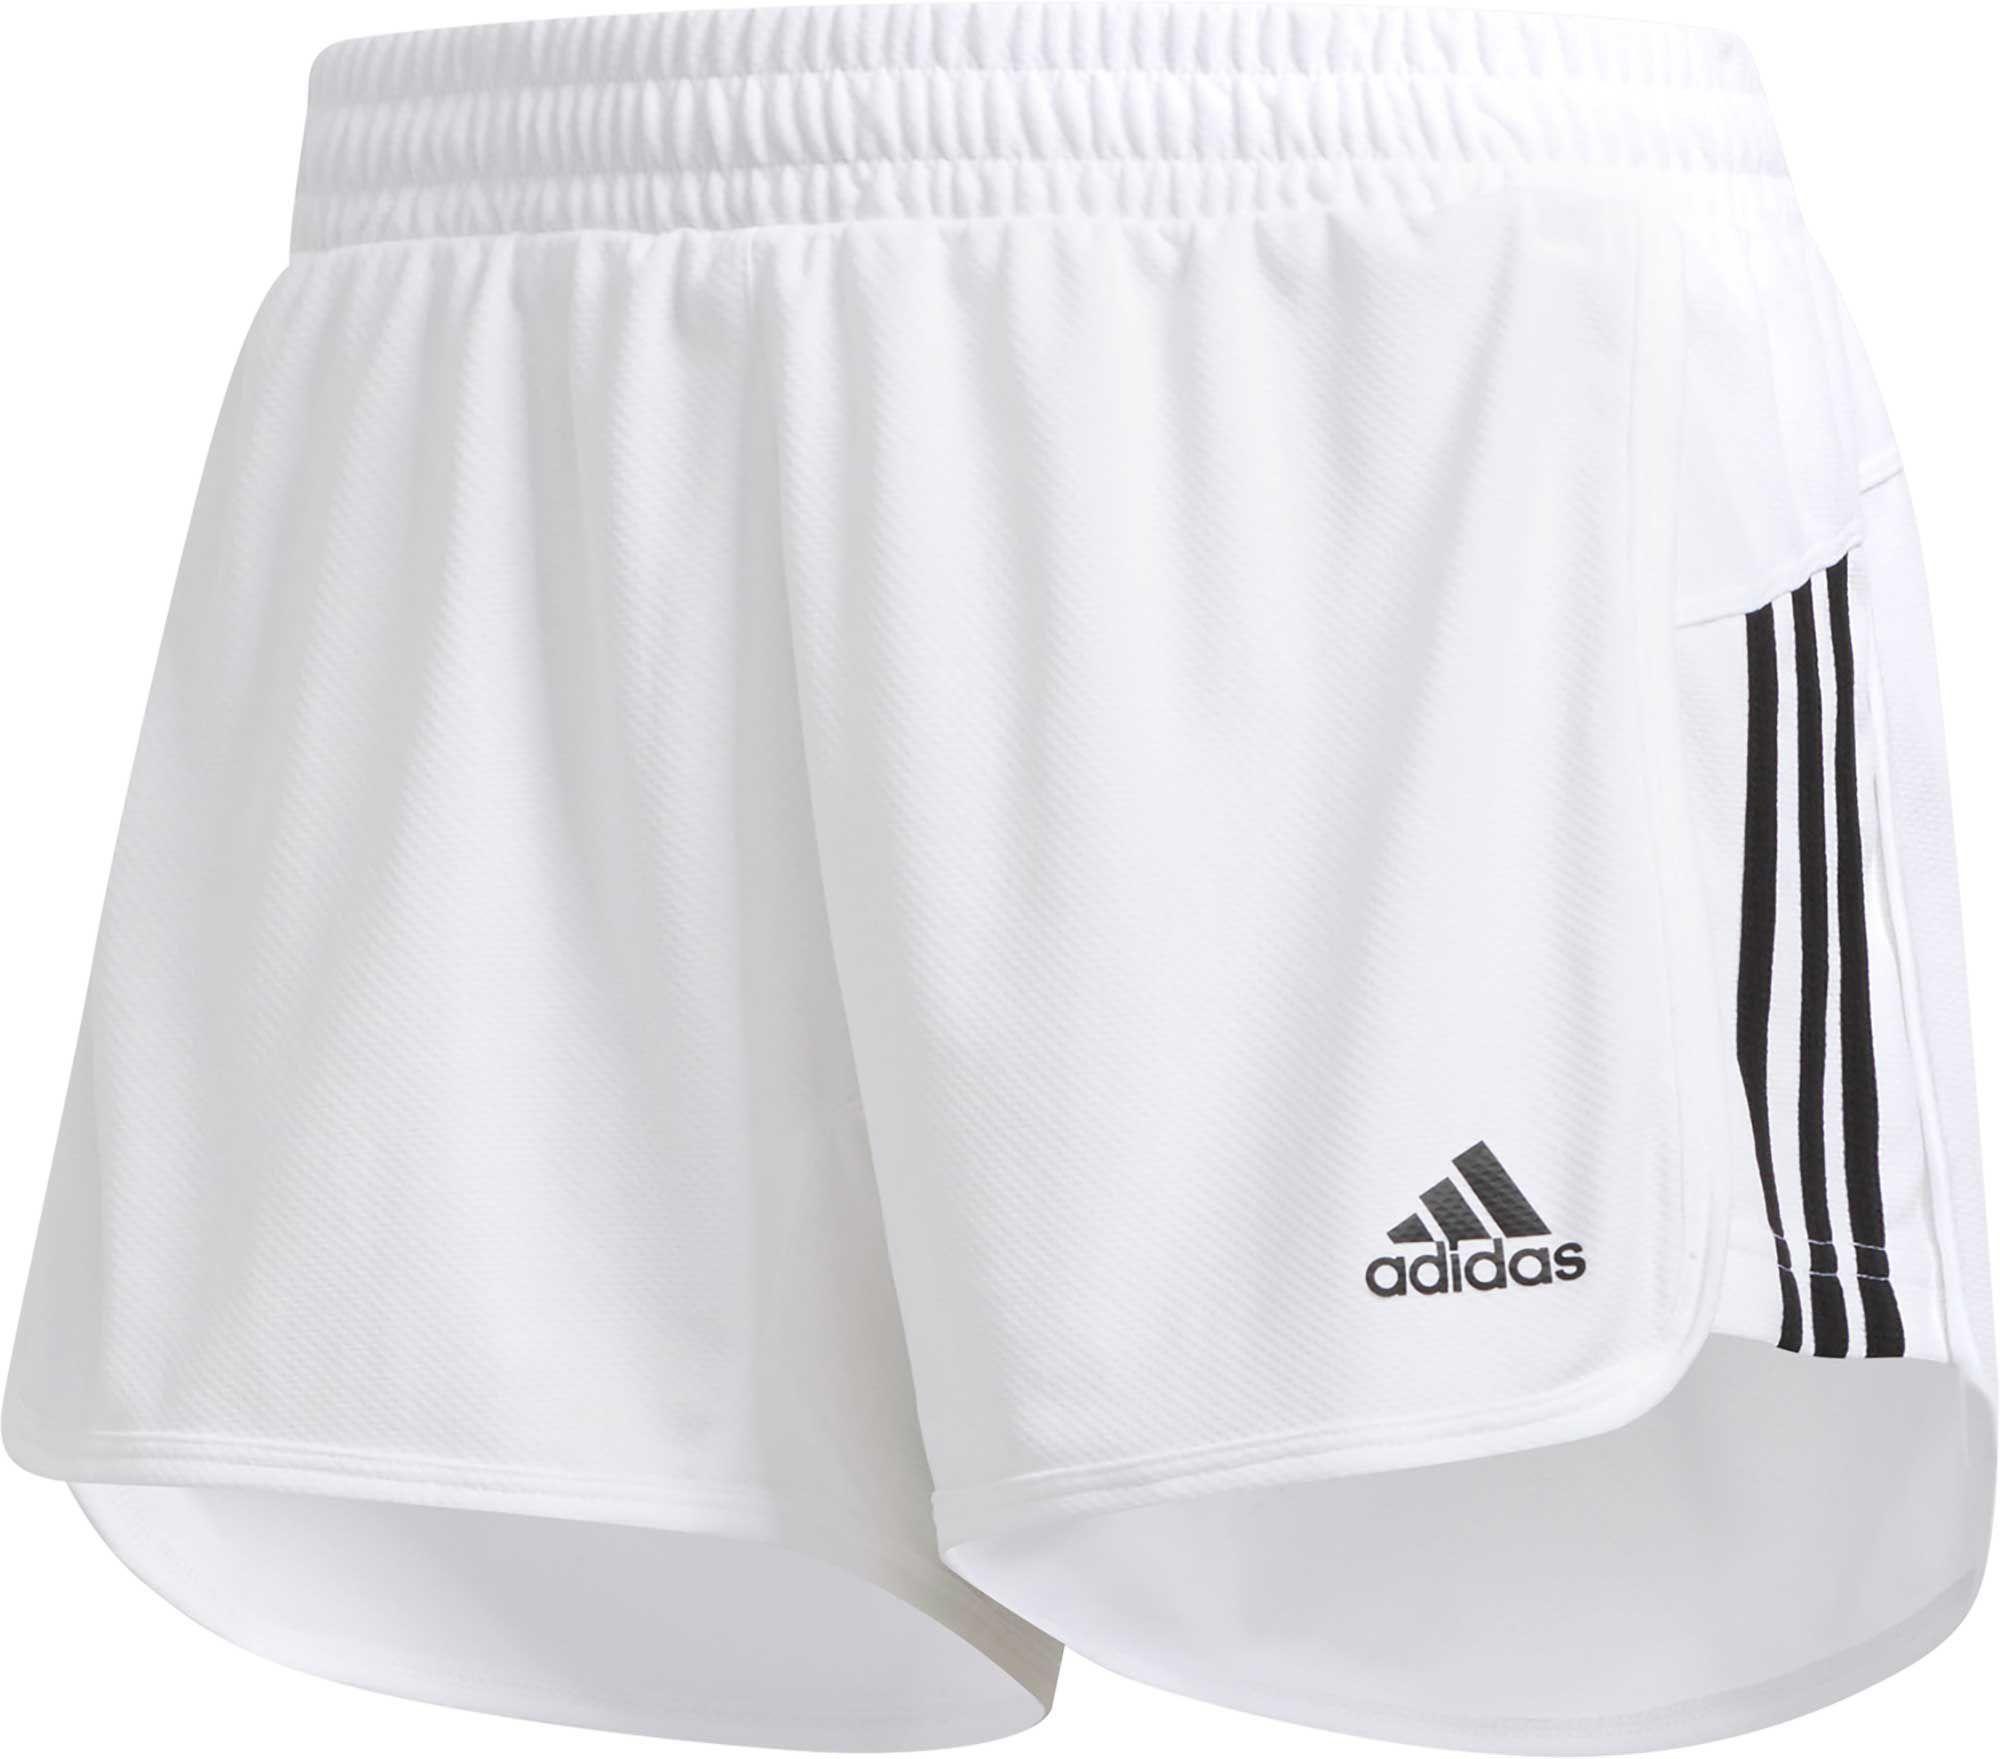 adidas Women's Ultimate Knit Shorts, White | Adidas damen